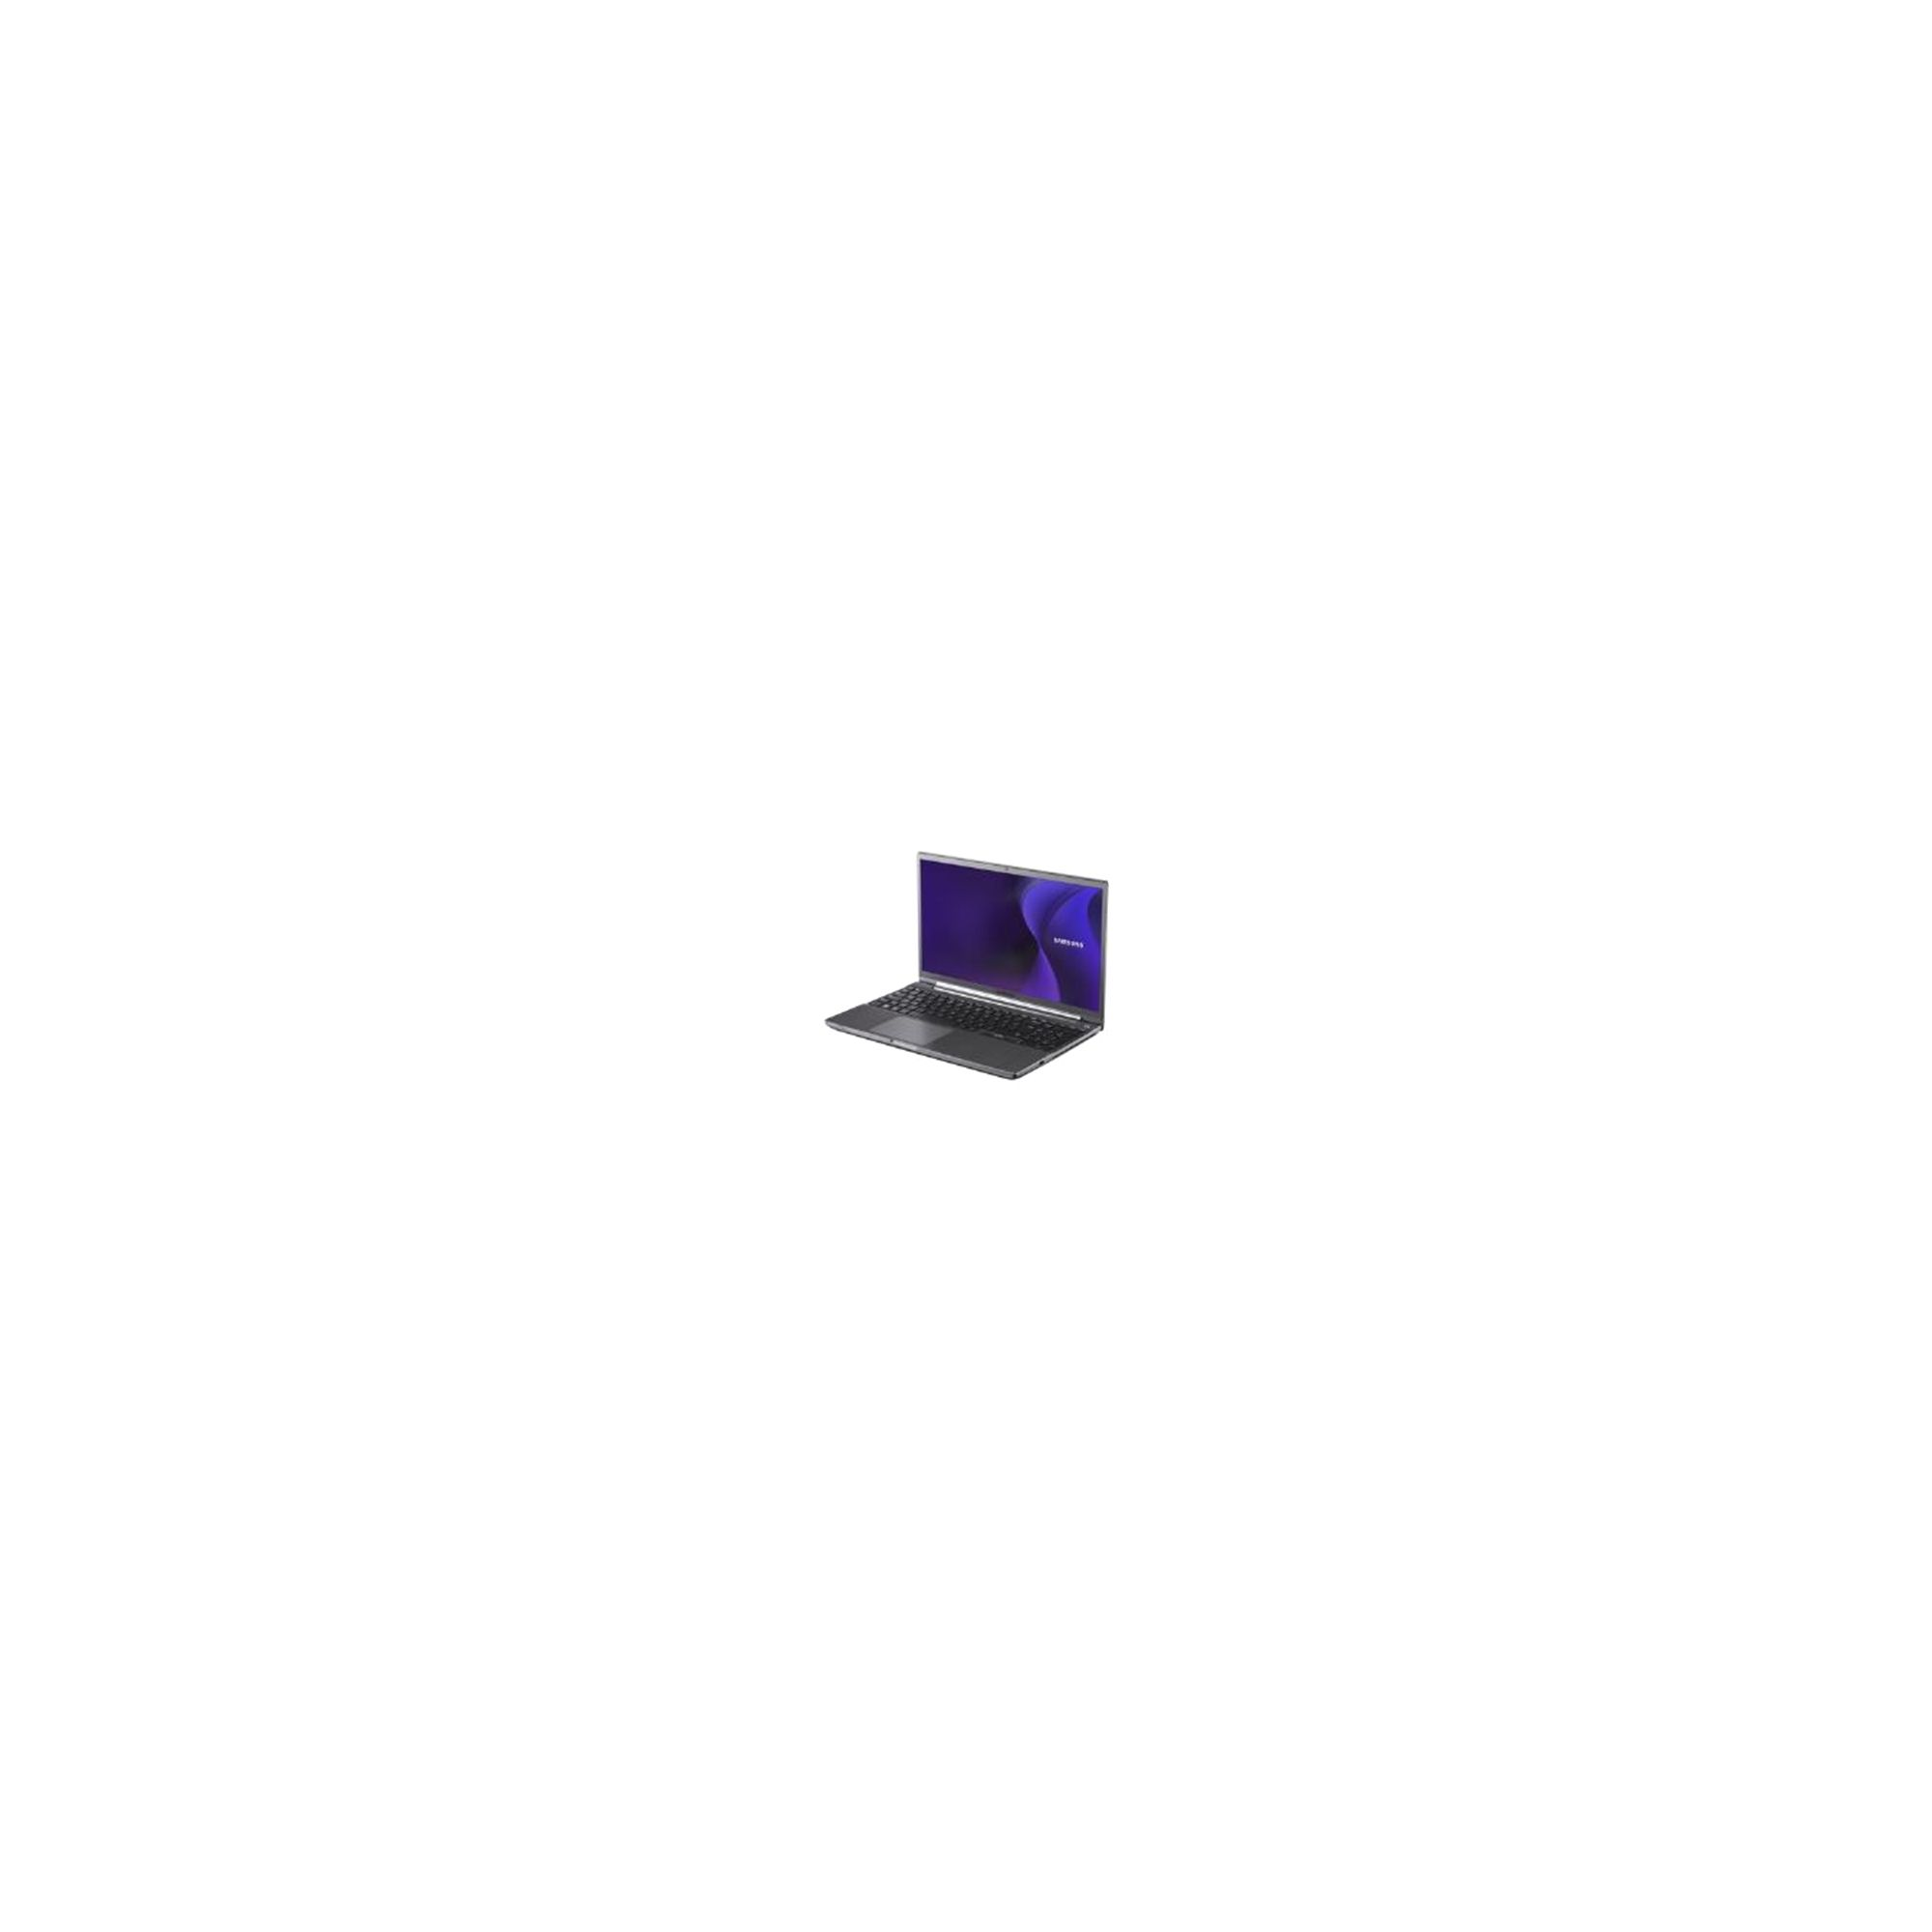 Samsung Series 7 Chronos 700Z (15.6 inch) Notebook Core i5 (3210M) 2.5GHz 8GB 1TB+8GB SSD SuperMulti DL WLAN BT Webcam Windows 7 Pro 64-bit (HD at Tesco Direct